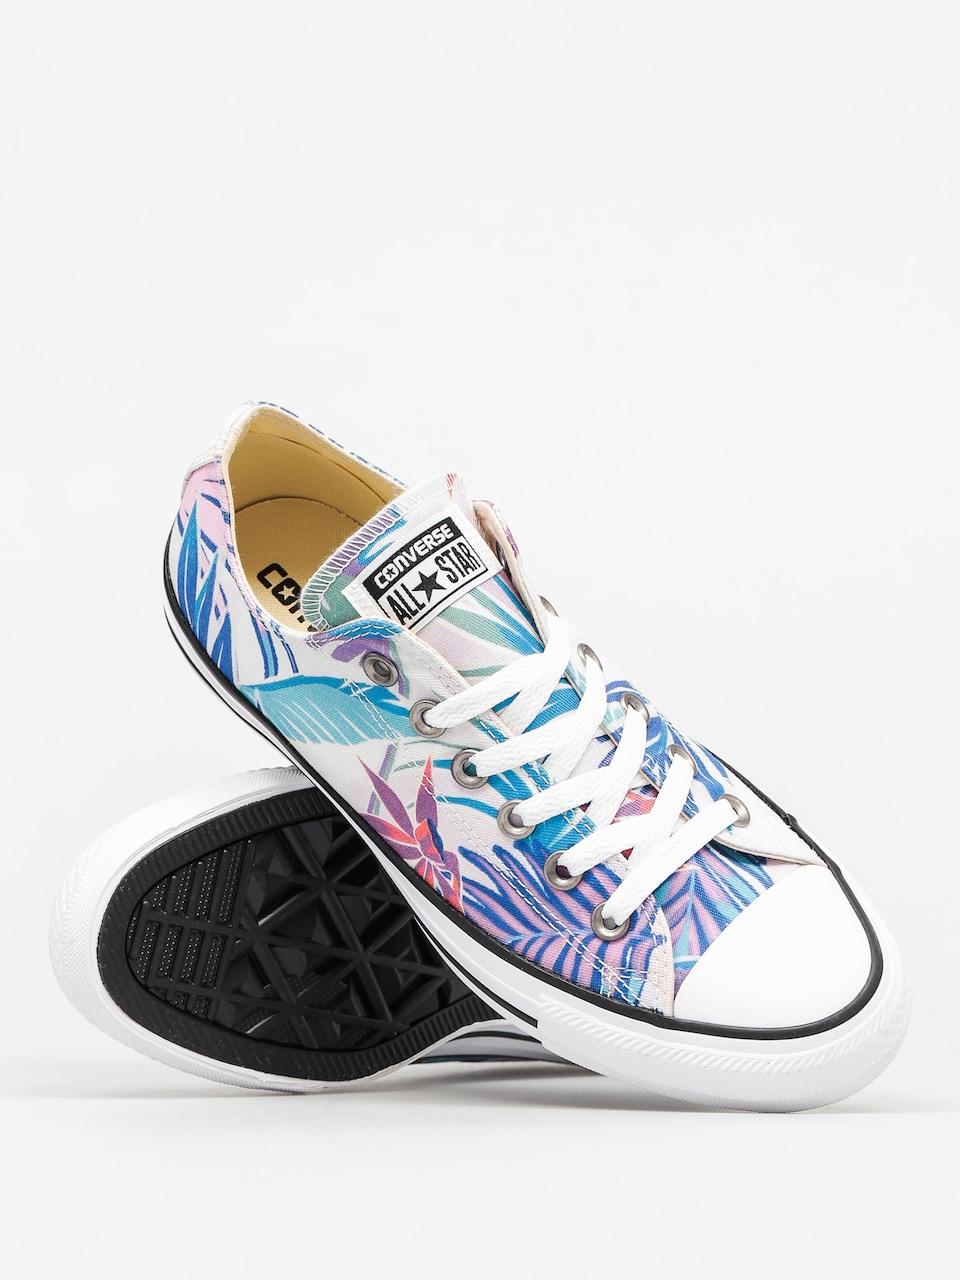 Sneakers CONVERSE Ctas Ox 155396C Fresh CyanMagenta GlowWhite